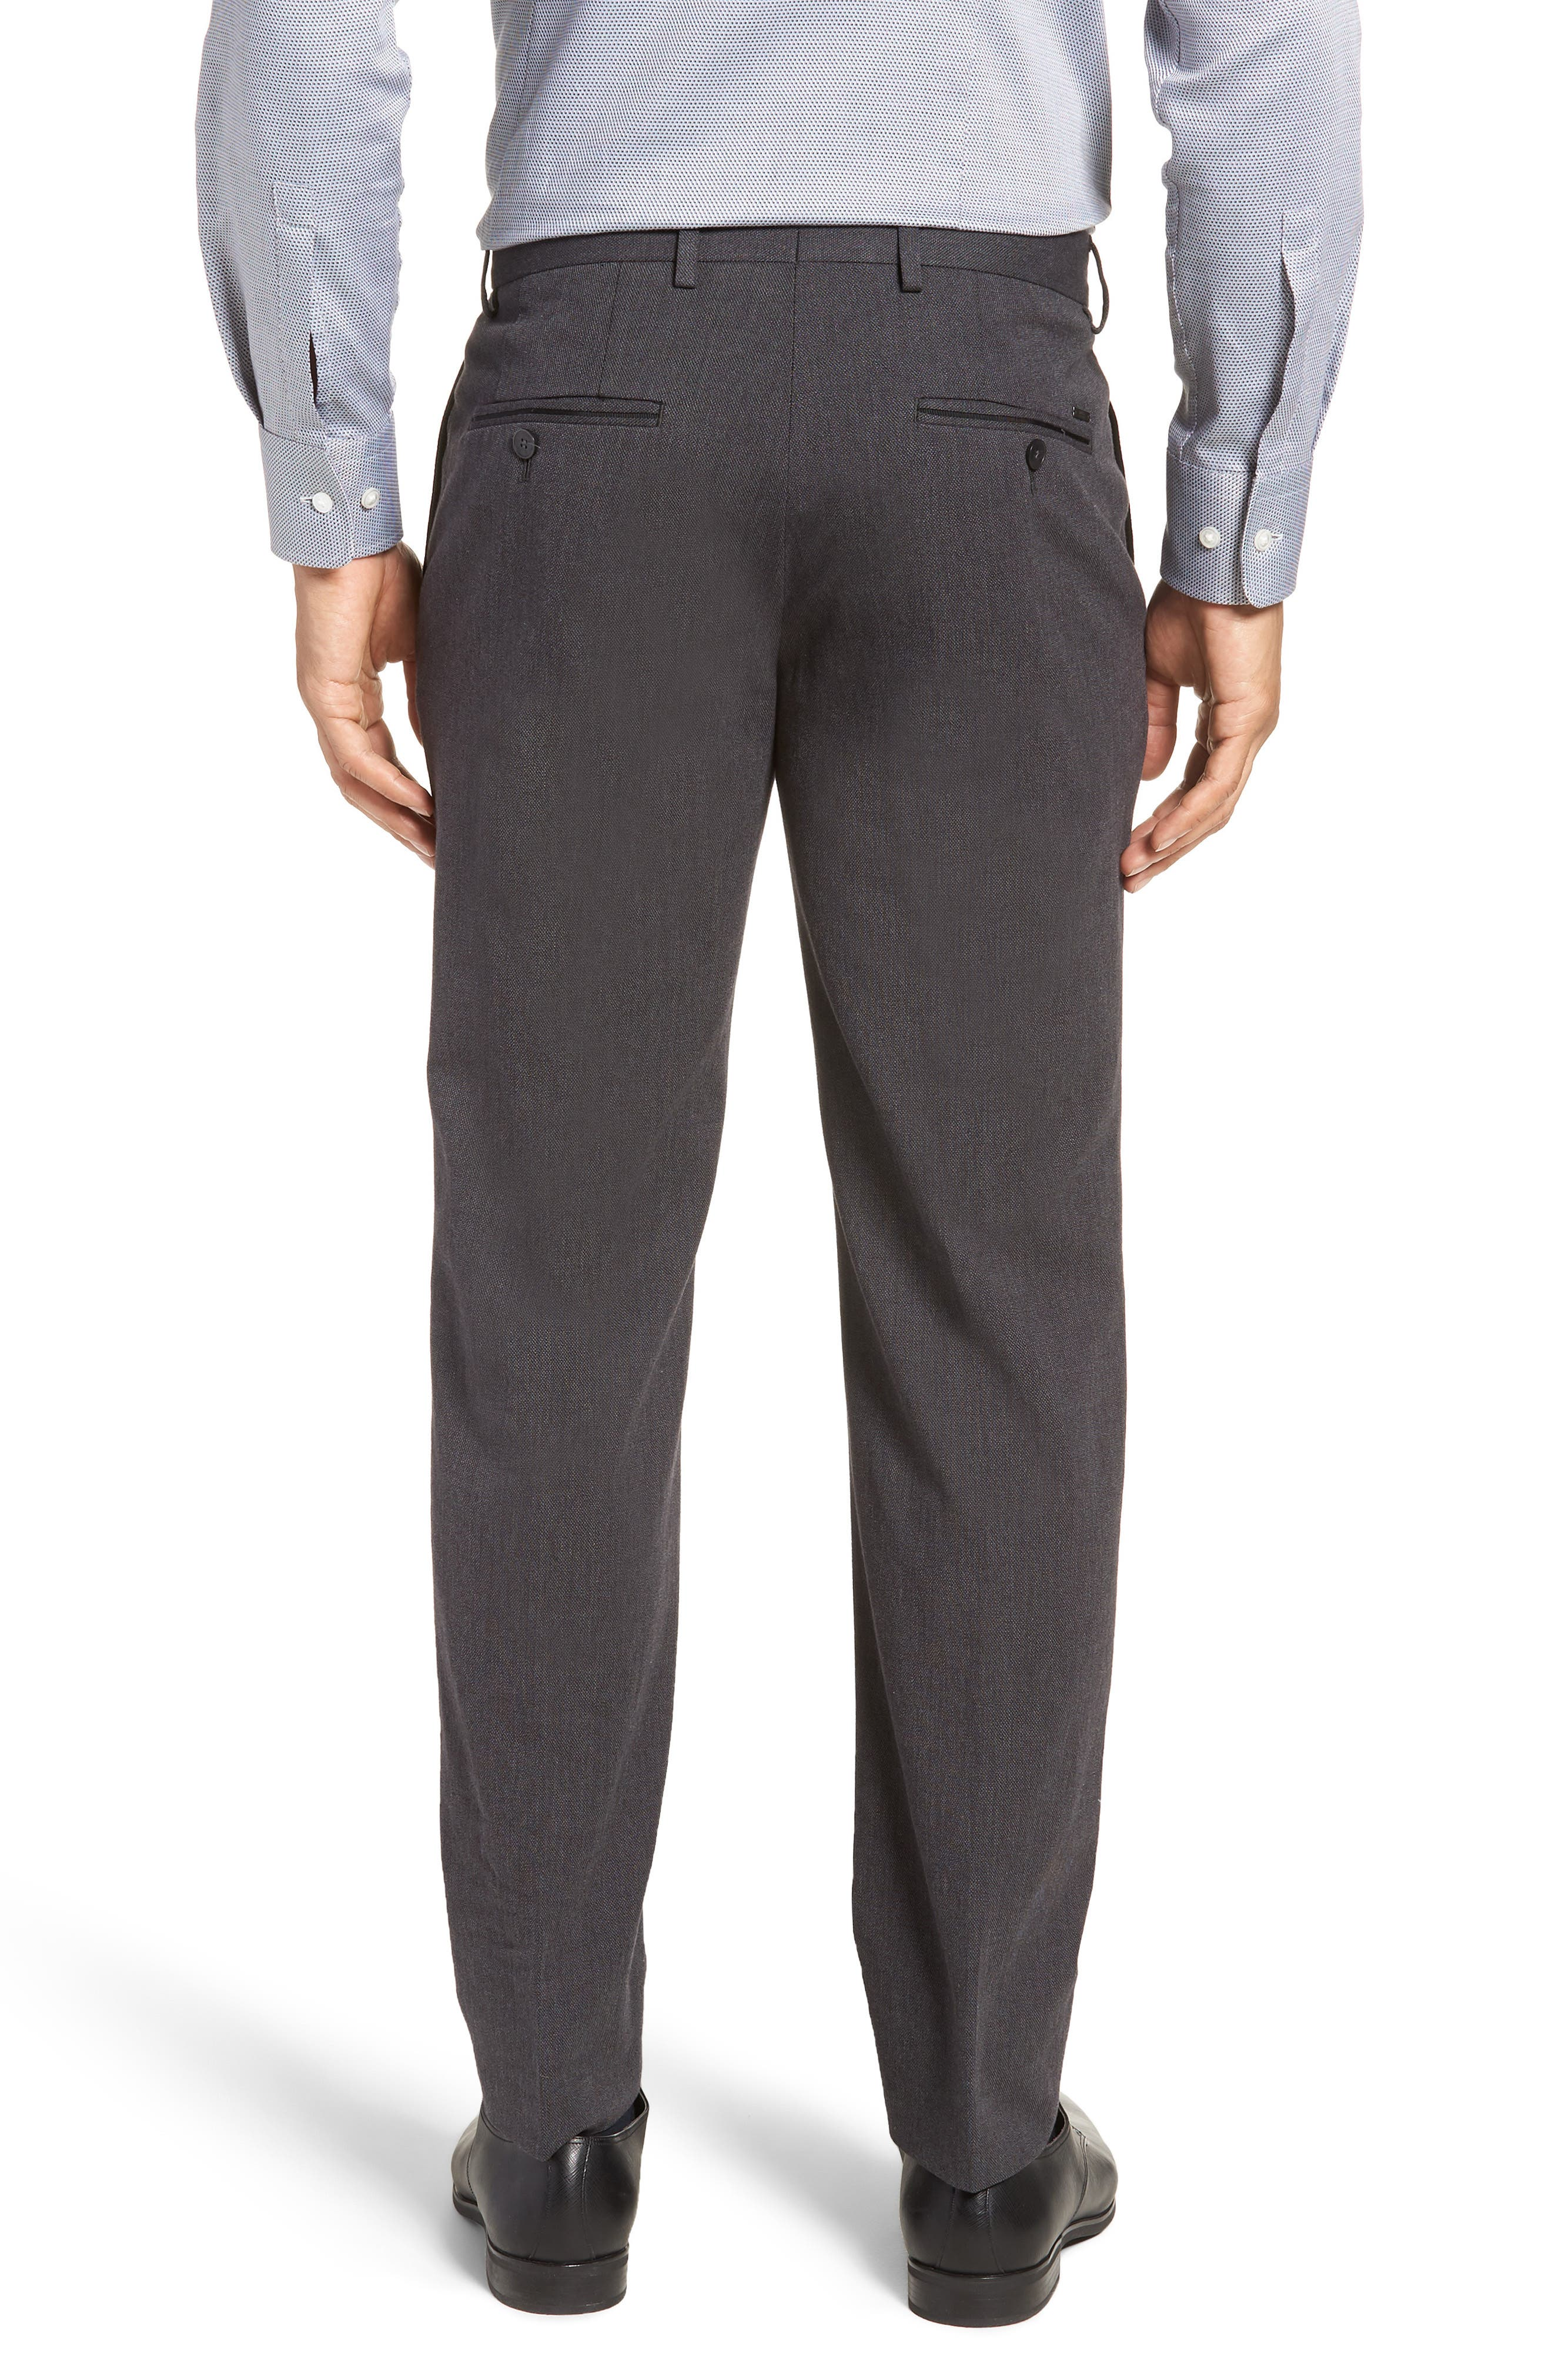 Batho Flat Front Solid Cotton Trousers,                             Alternate thumbnail 2, color,                             MEDIUM GREY